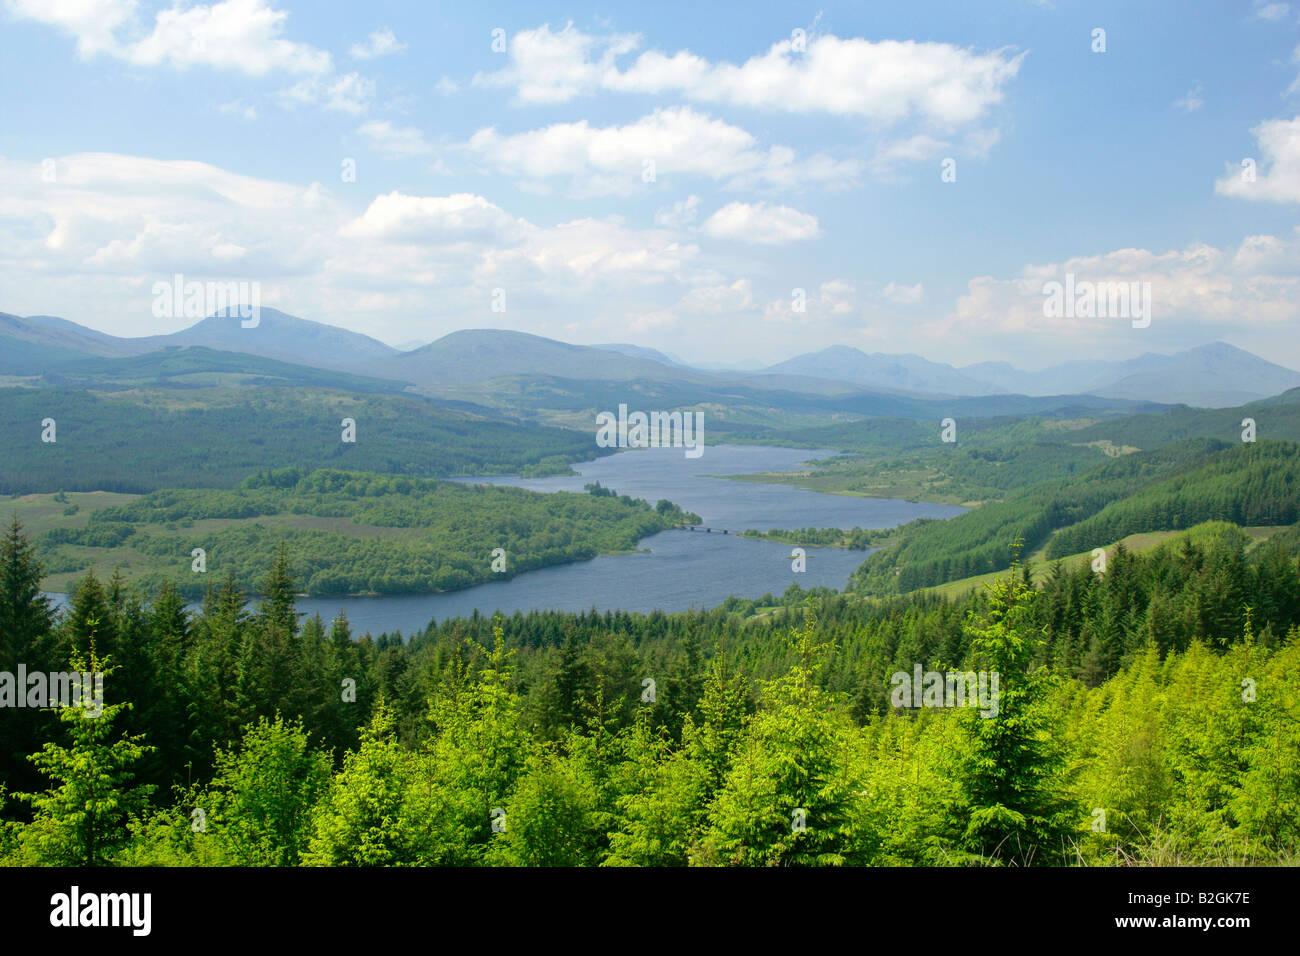 Loch Garry woodlands mountains Lochaber Highlands Scotland UK landscape scenery Stock Photo